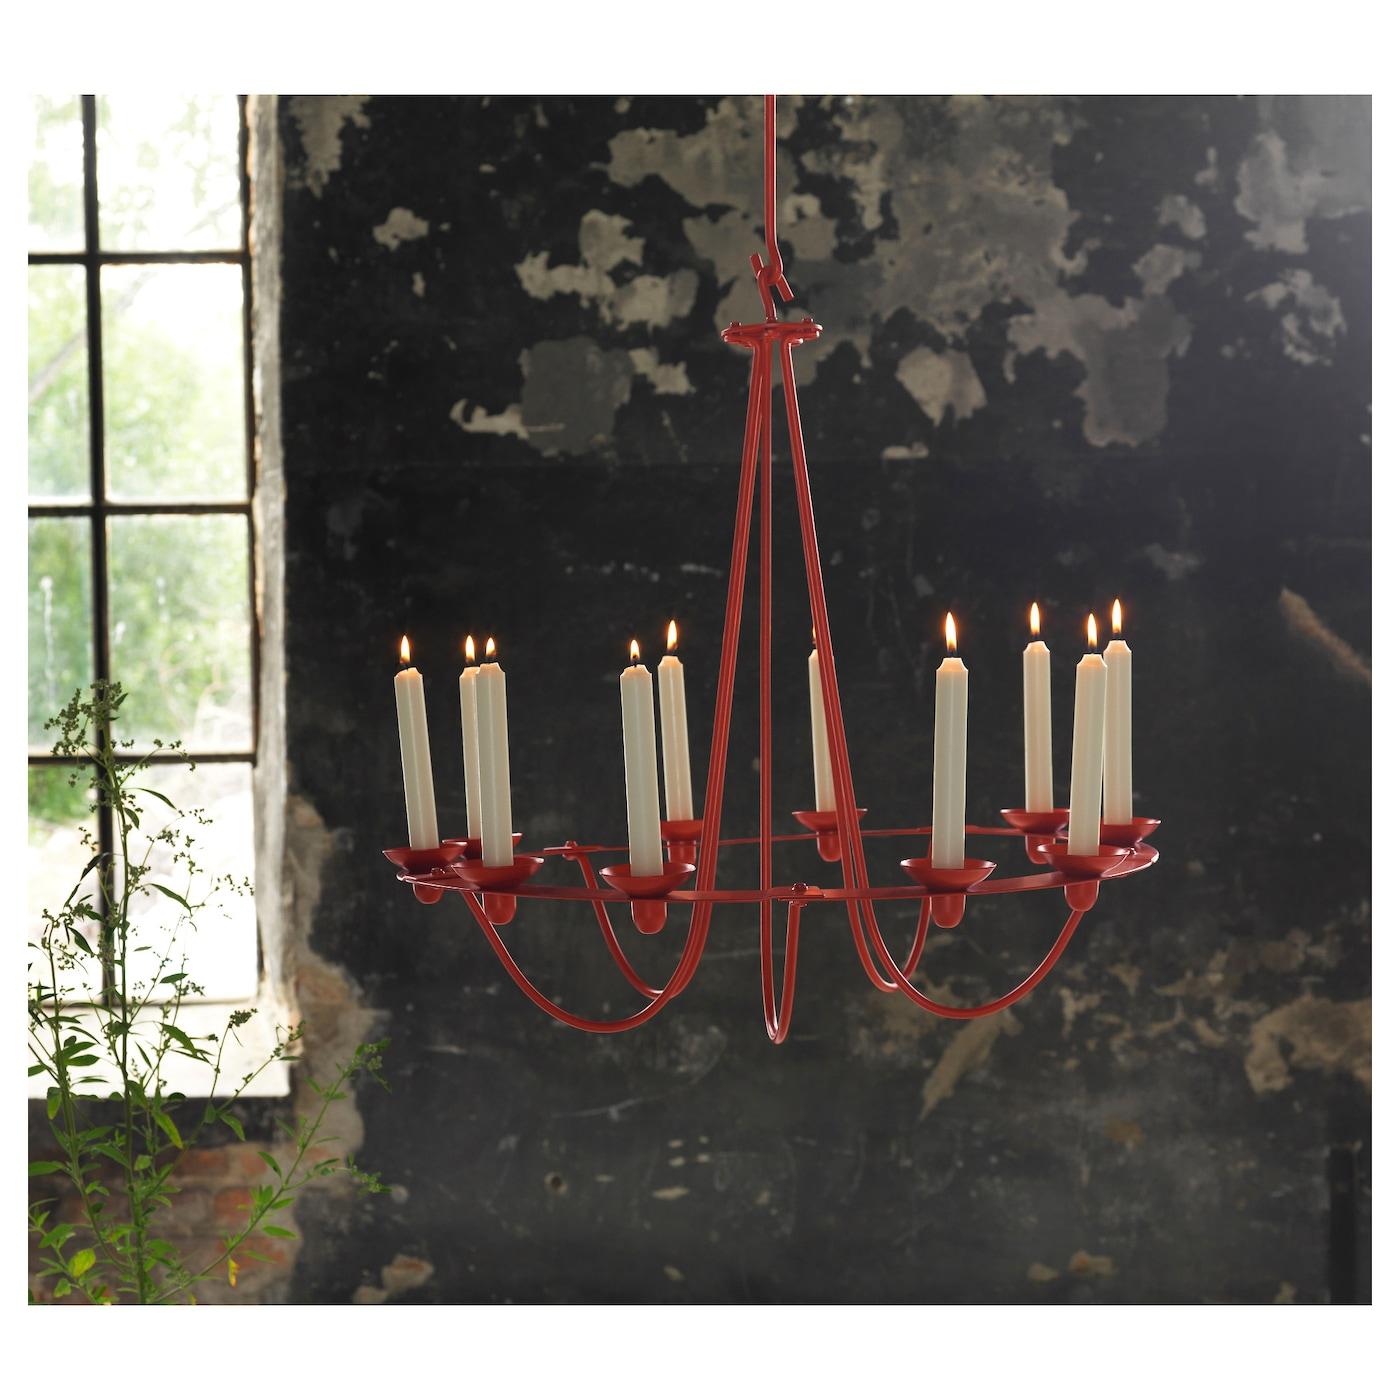 Ikea Red Chandelier: VÄSSAD Chandelier For 10 Candles Dark Grey